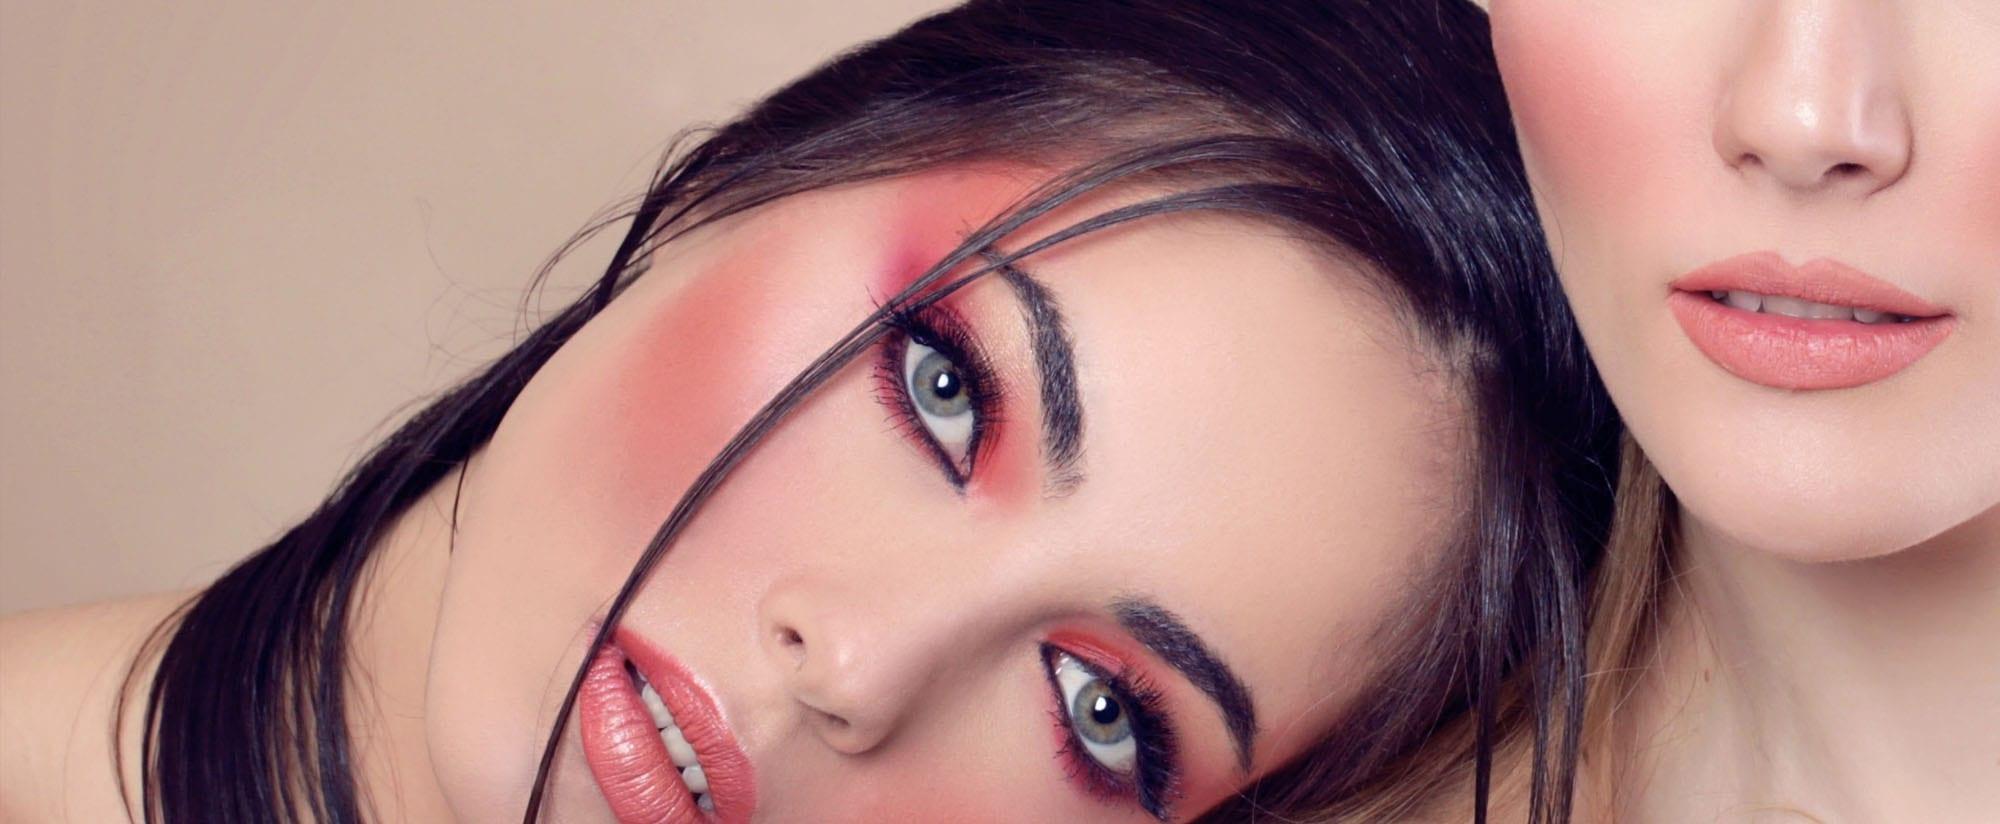 Fashion Israel - 2020 חדשות אופנה, כתבות אופנה 2020, טרנדים, מגזין אופנה, אופנה - איפור ירין שחף, צילום מיכה קיזנר